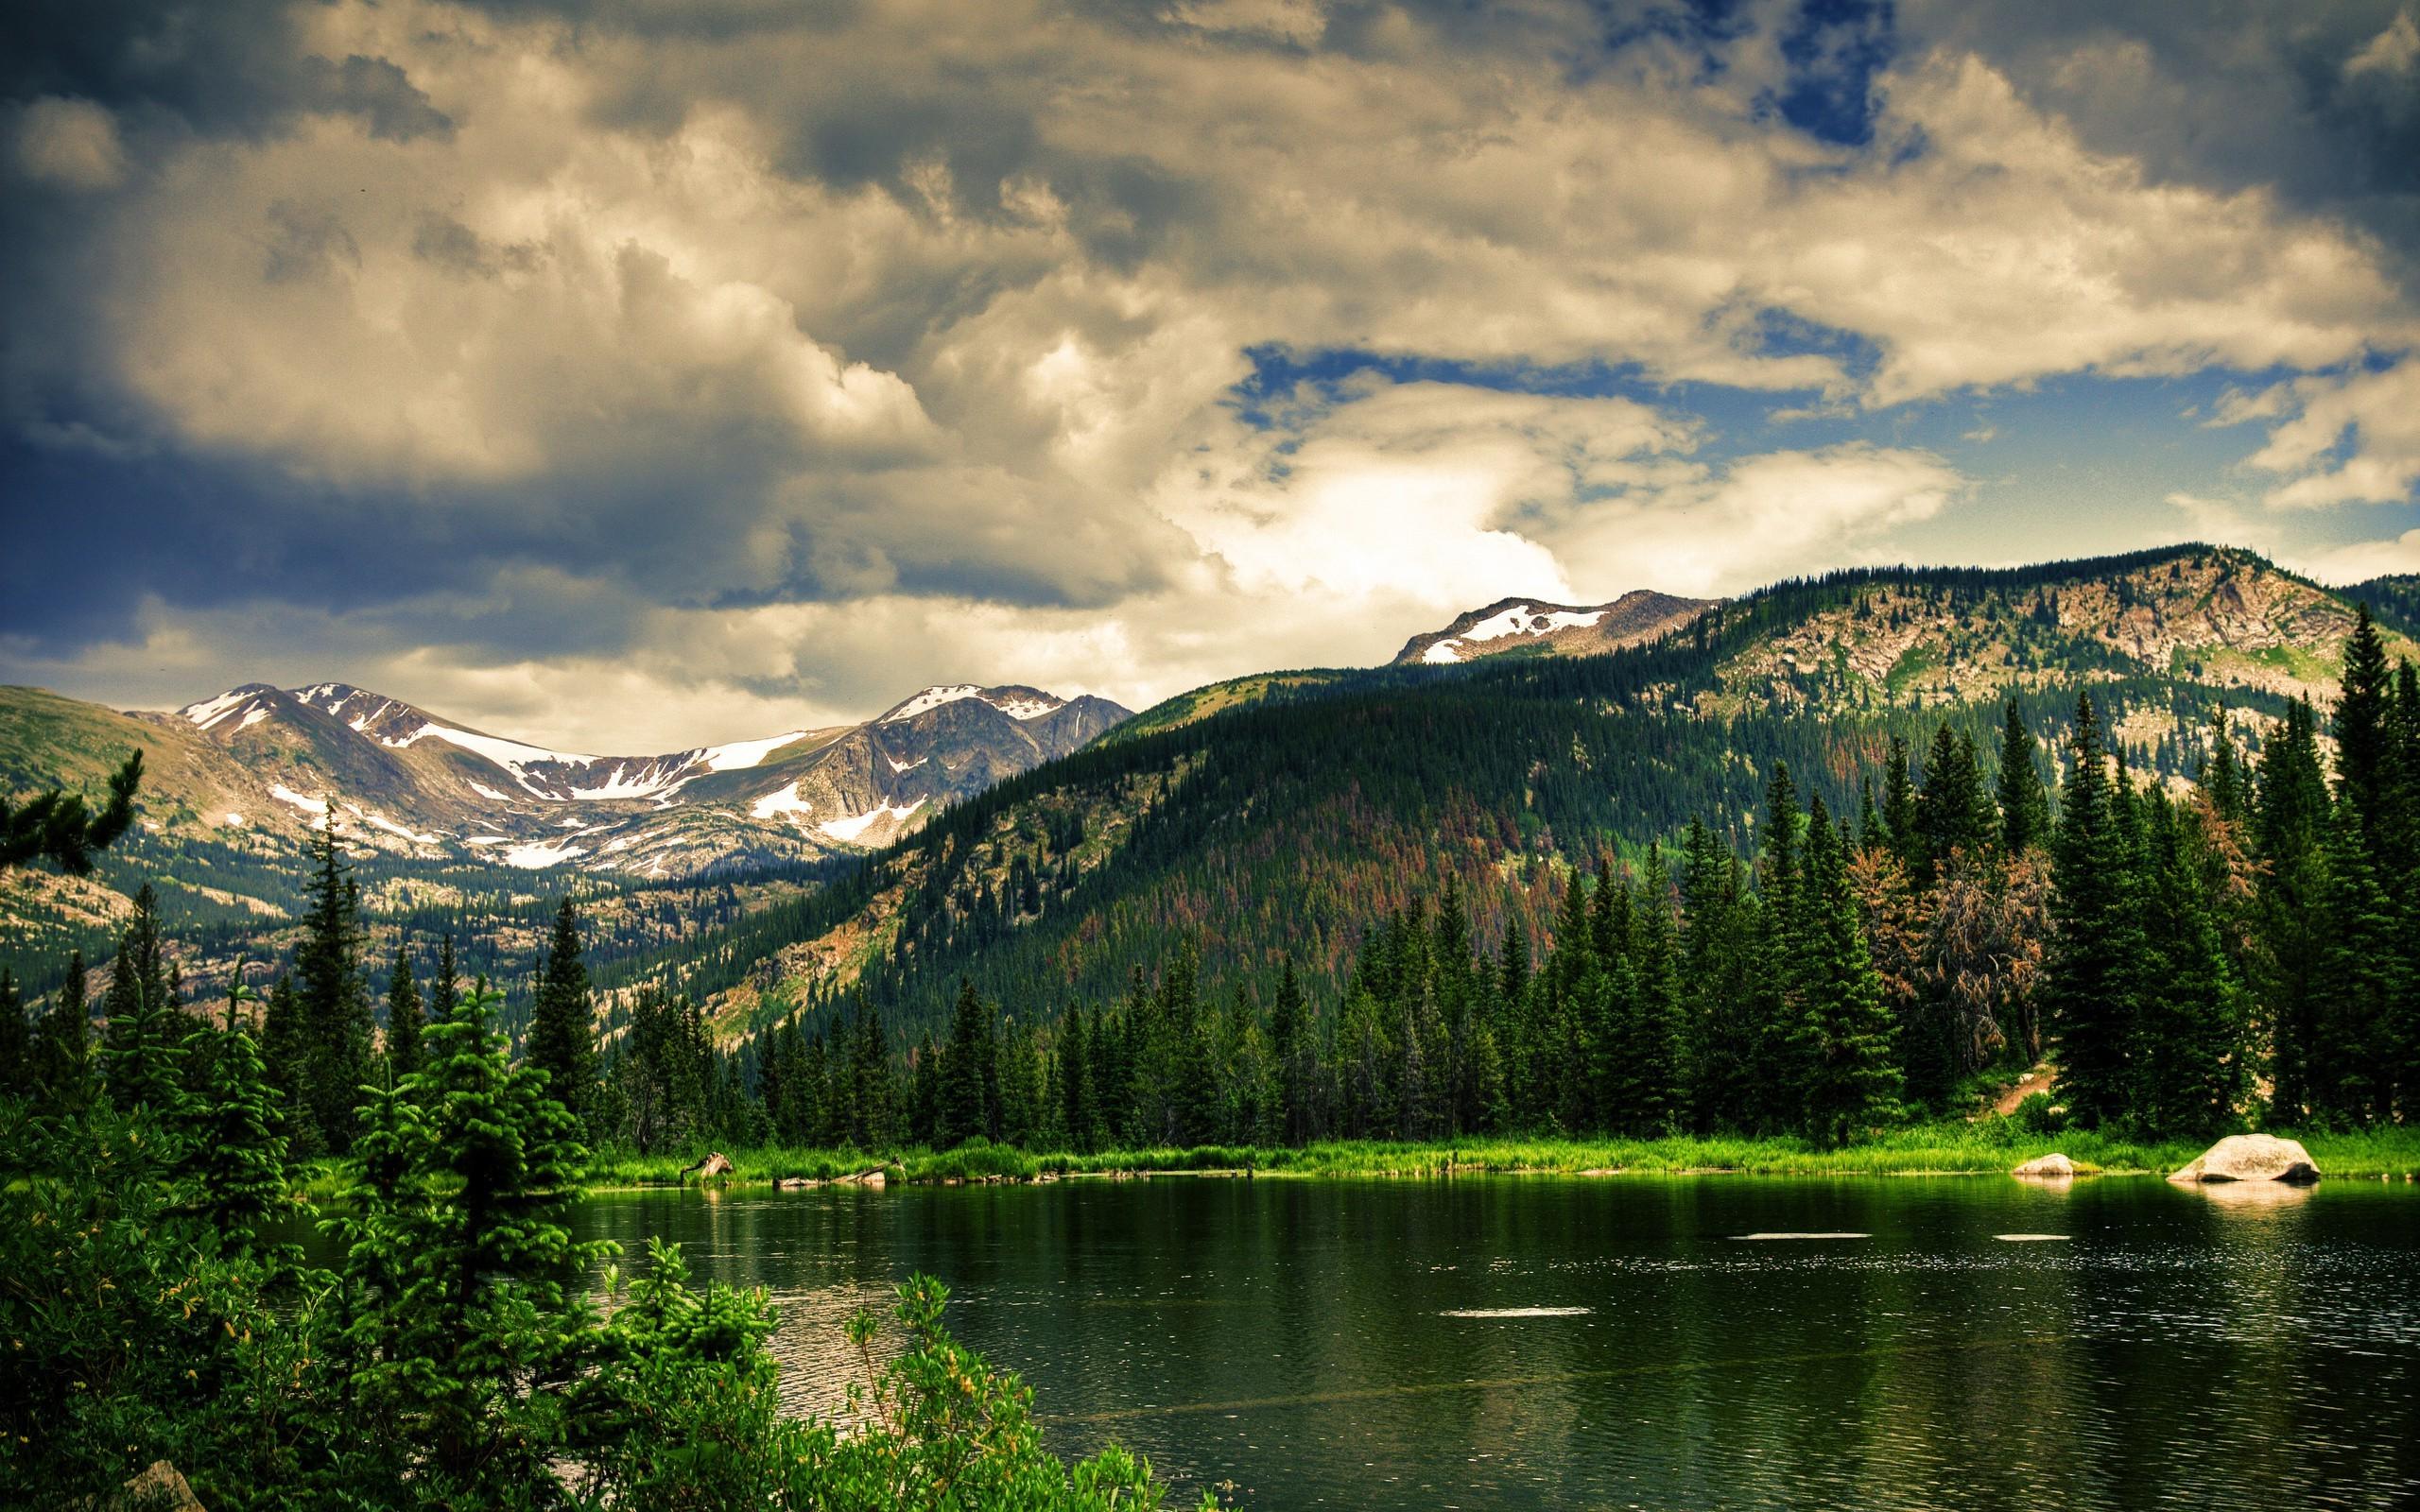 nature view wallpaper,mountainous landforms,highland,mountain,natural landscape,nature